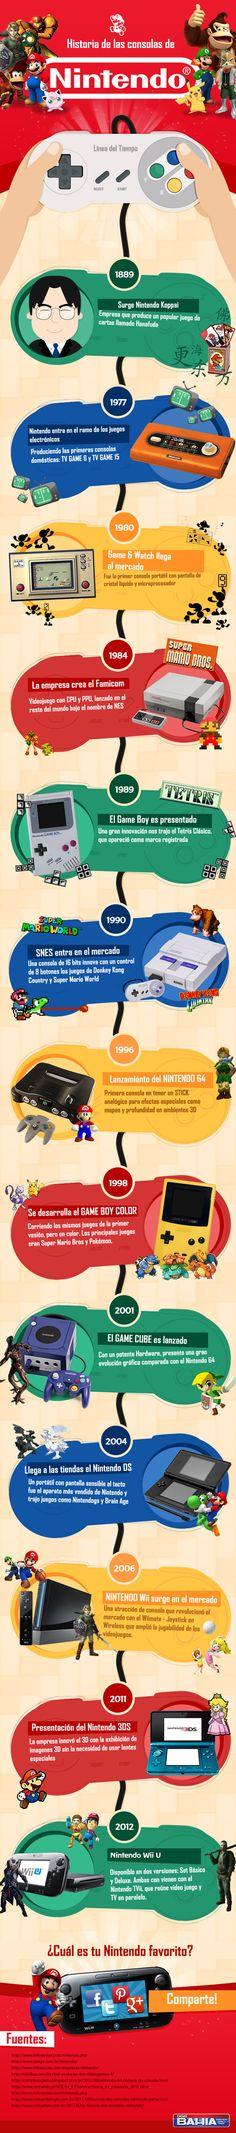 Historia de las consolas de Nintendo #infografia